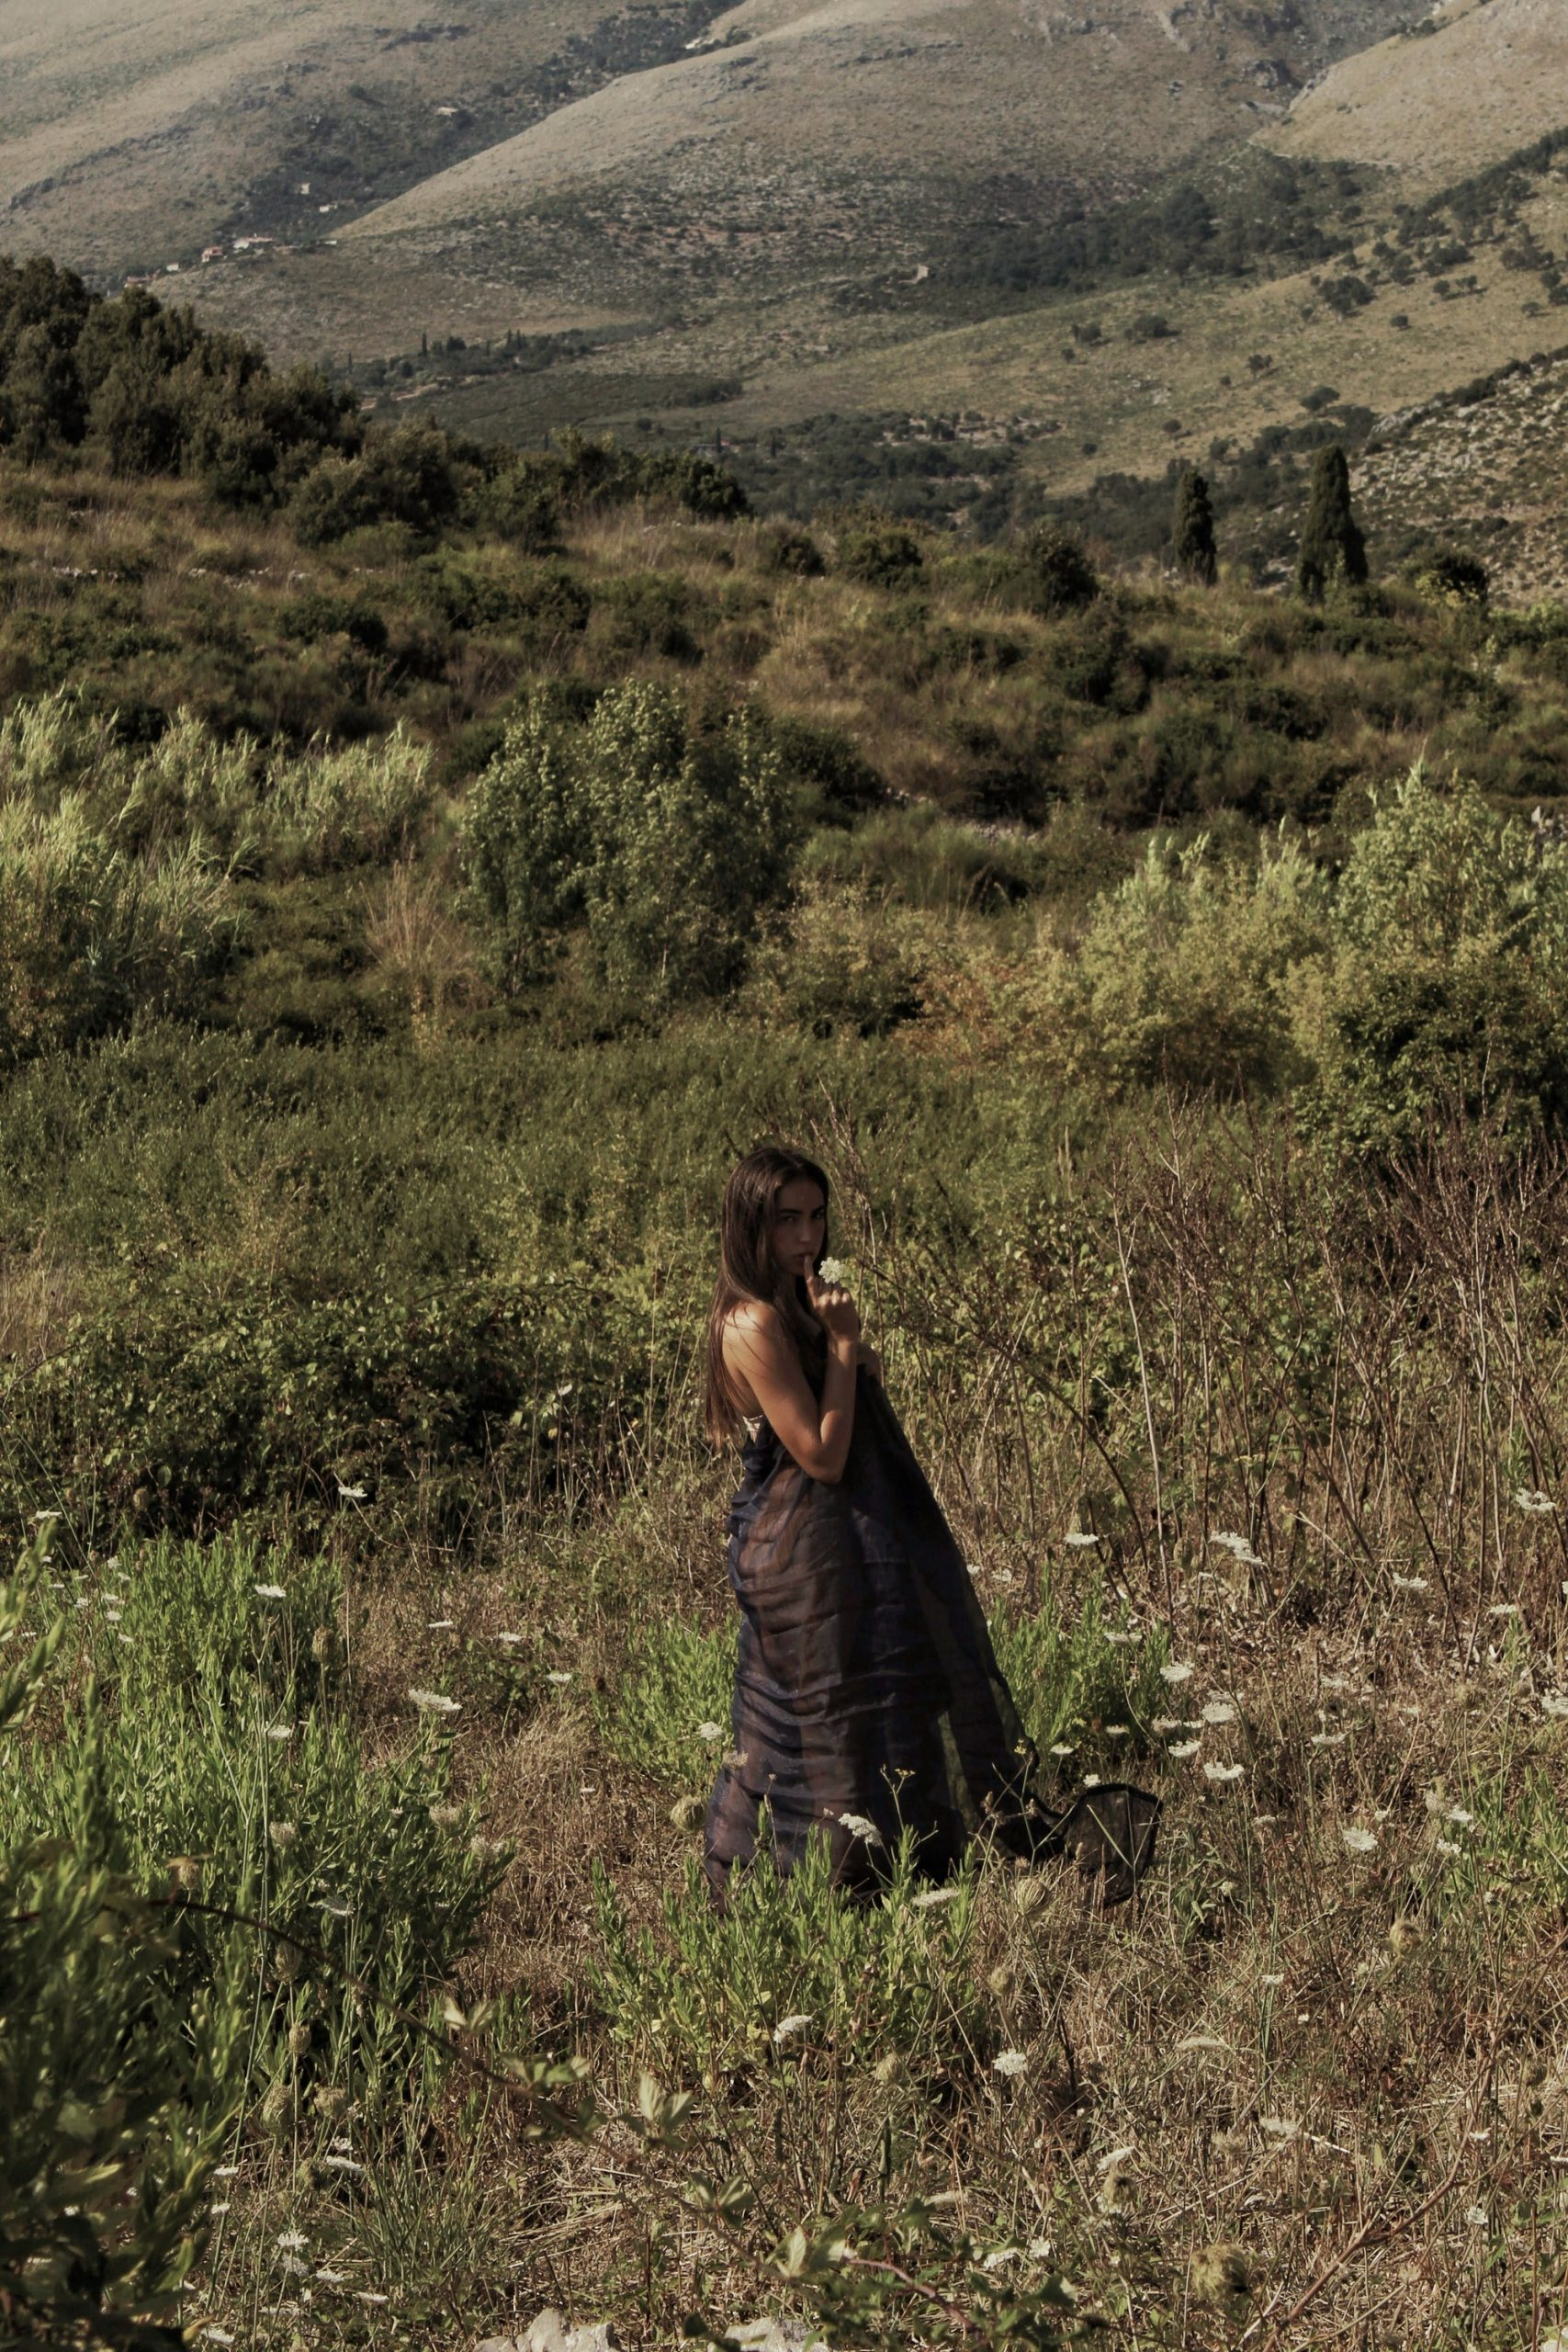 Categorie: Fashion, Fine Art, Glamour, Portrait - Photographer: CRISTIAN IACONO (@photosofglobe) - Location: Formia, LT, Italia